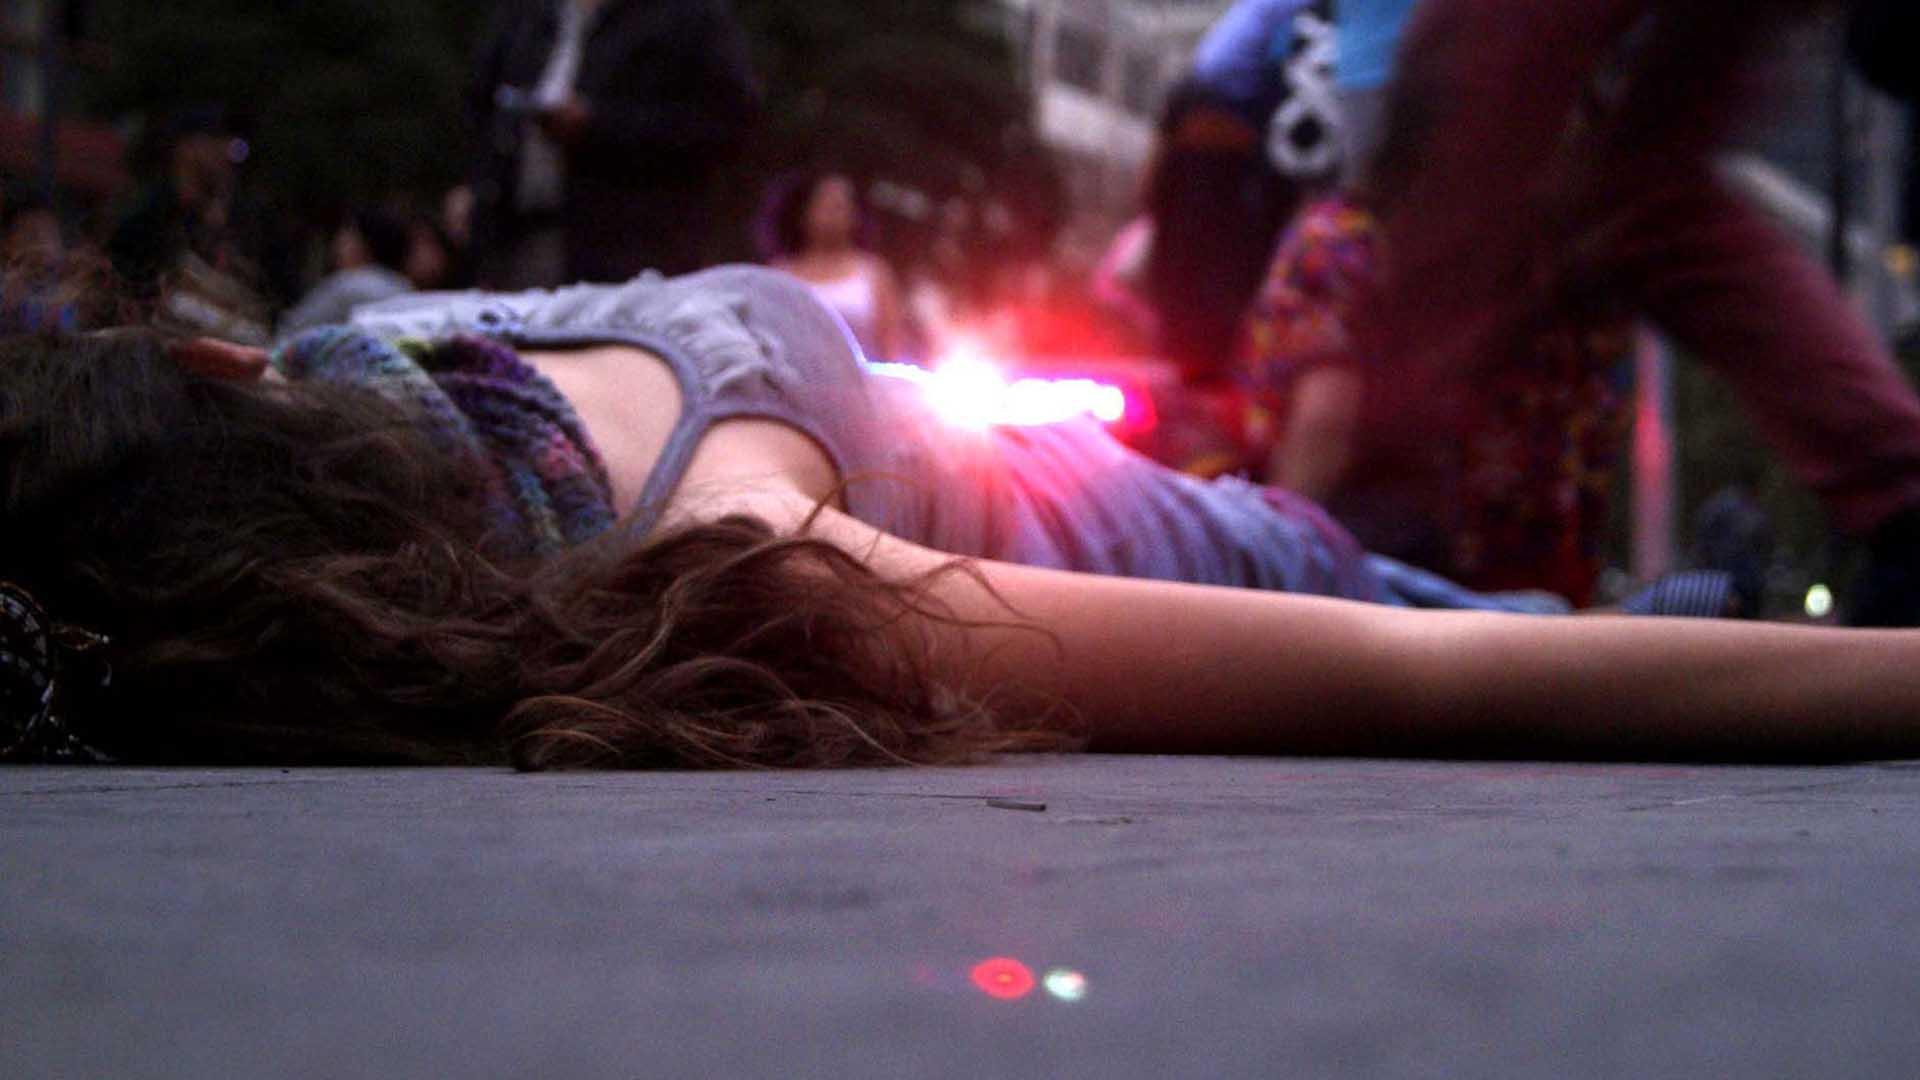 15 municipios mexiquenses dentro de los 100 primeros del país por feminicidios